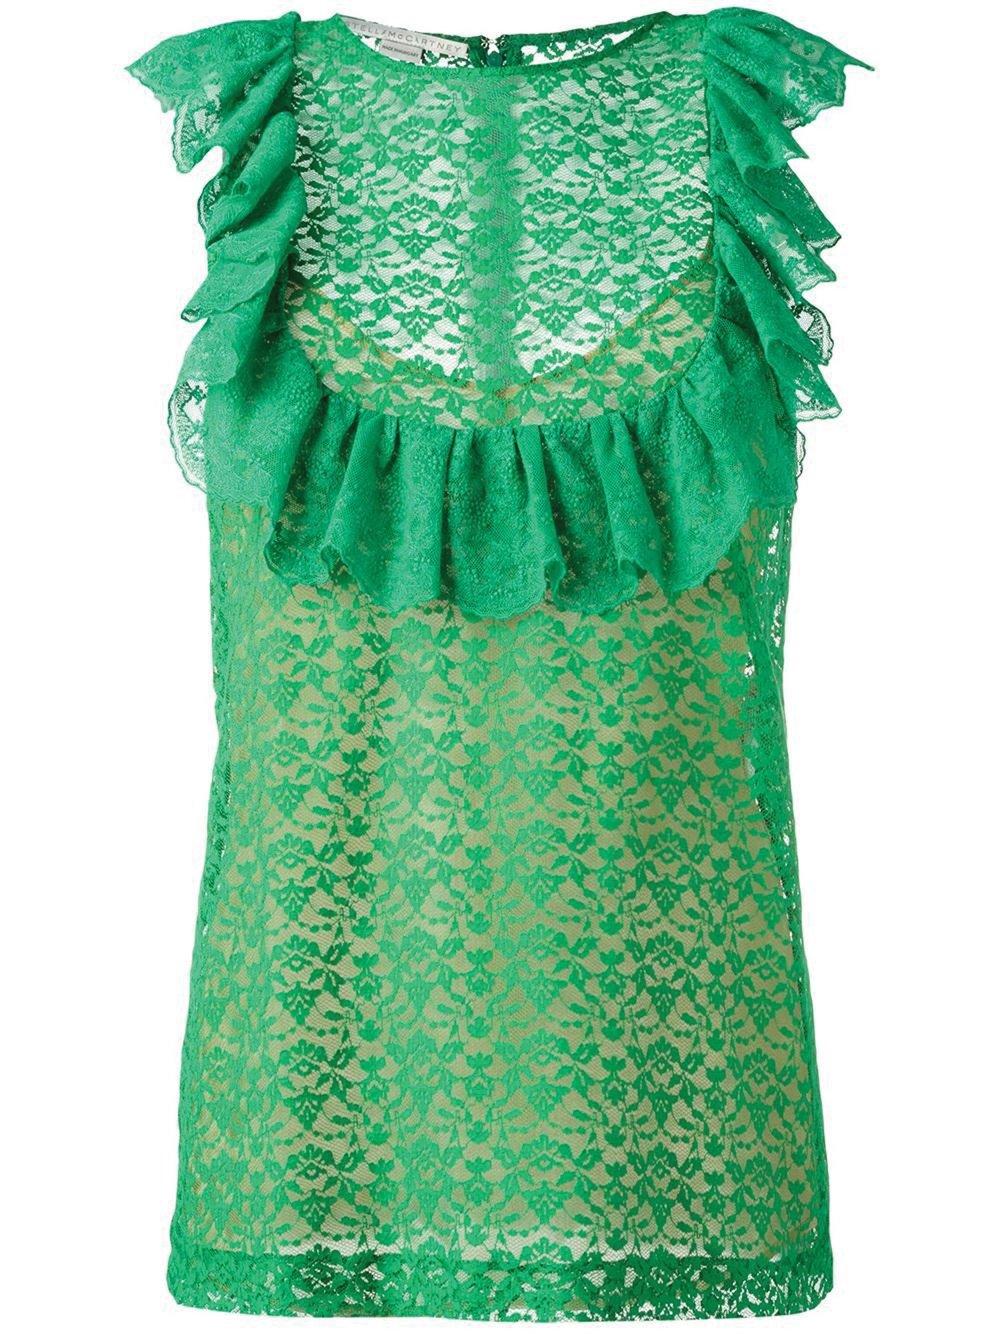 Flounce Sleeveless Blouse by Stella McCartney $1,276 斯特拉.麥卡特尼坎袖上衣